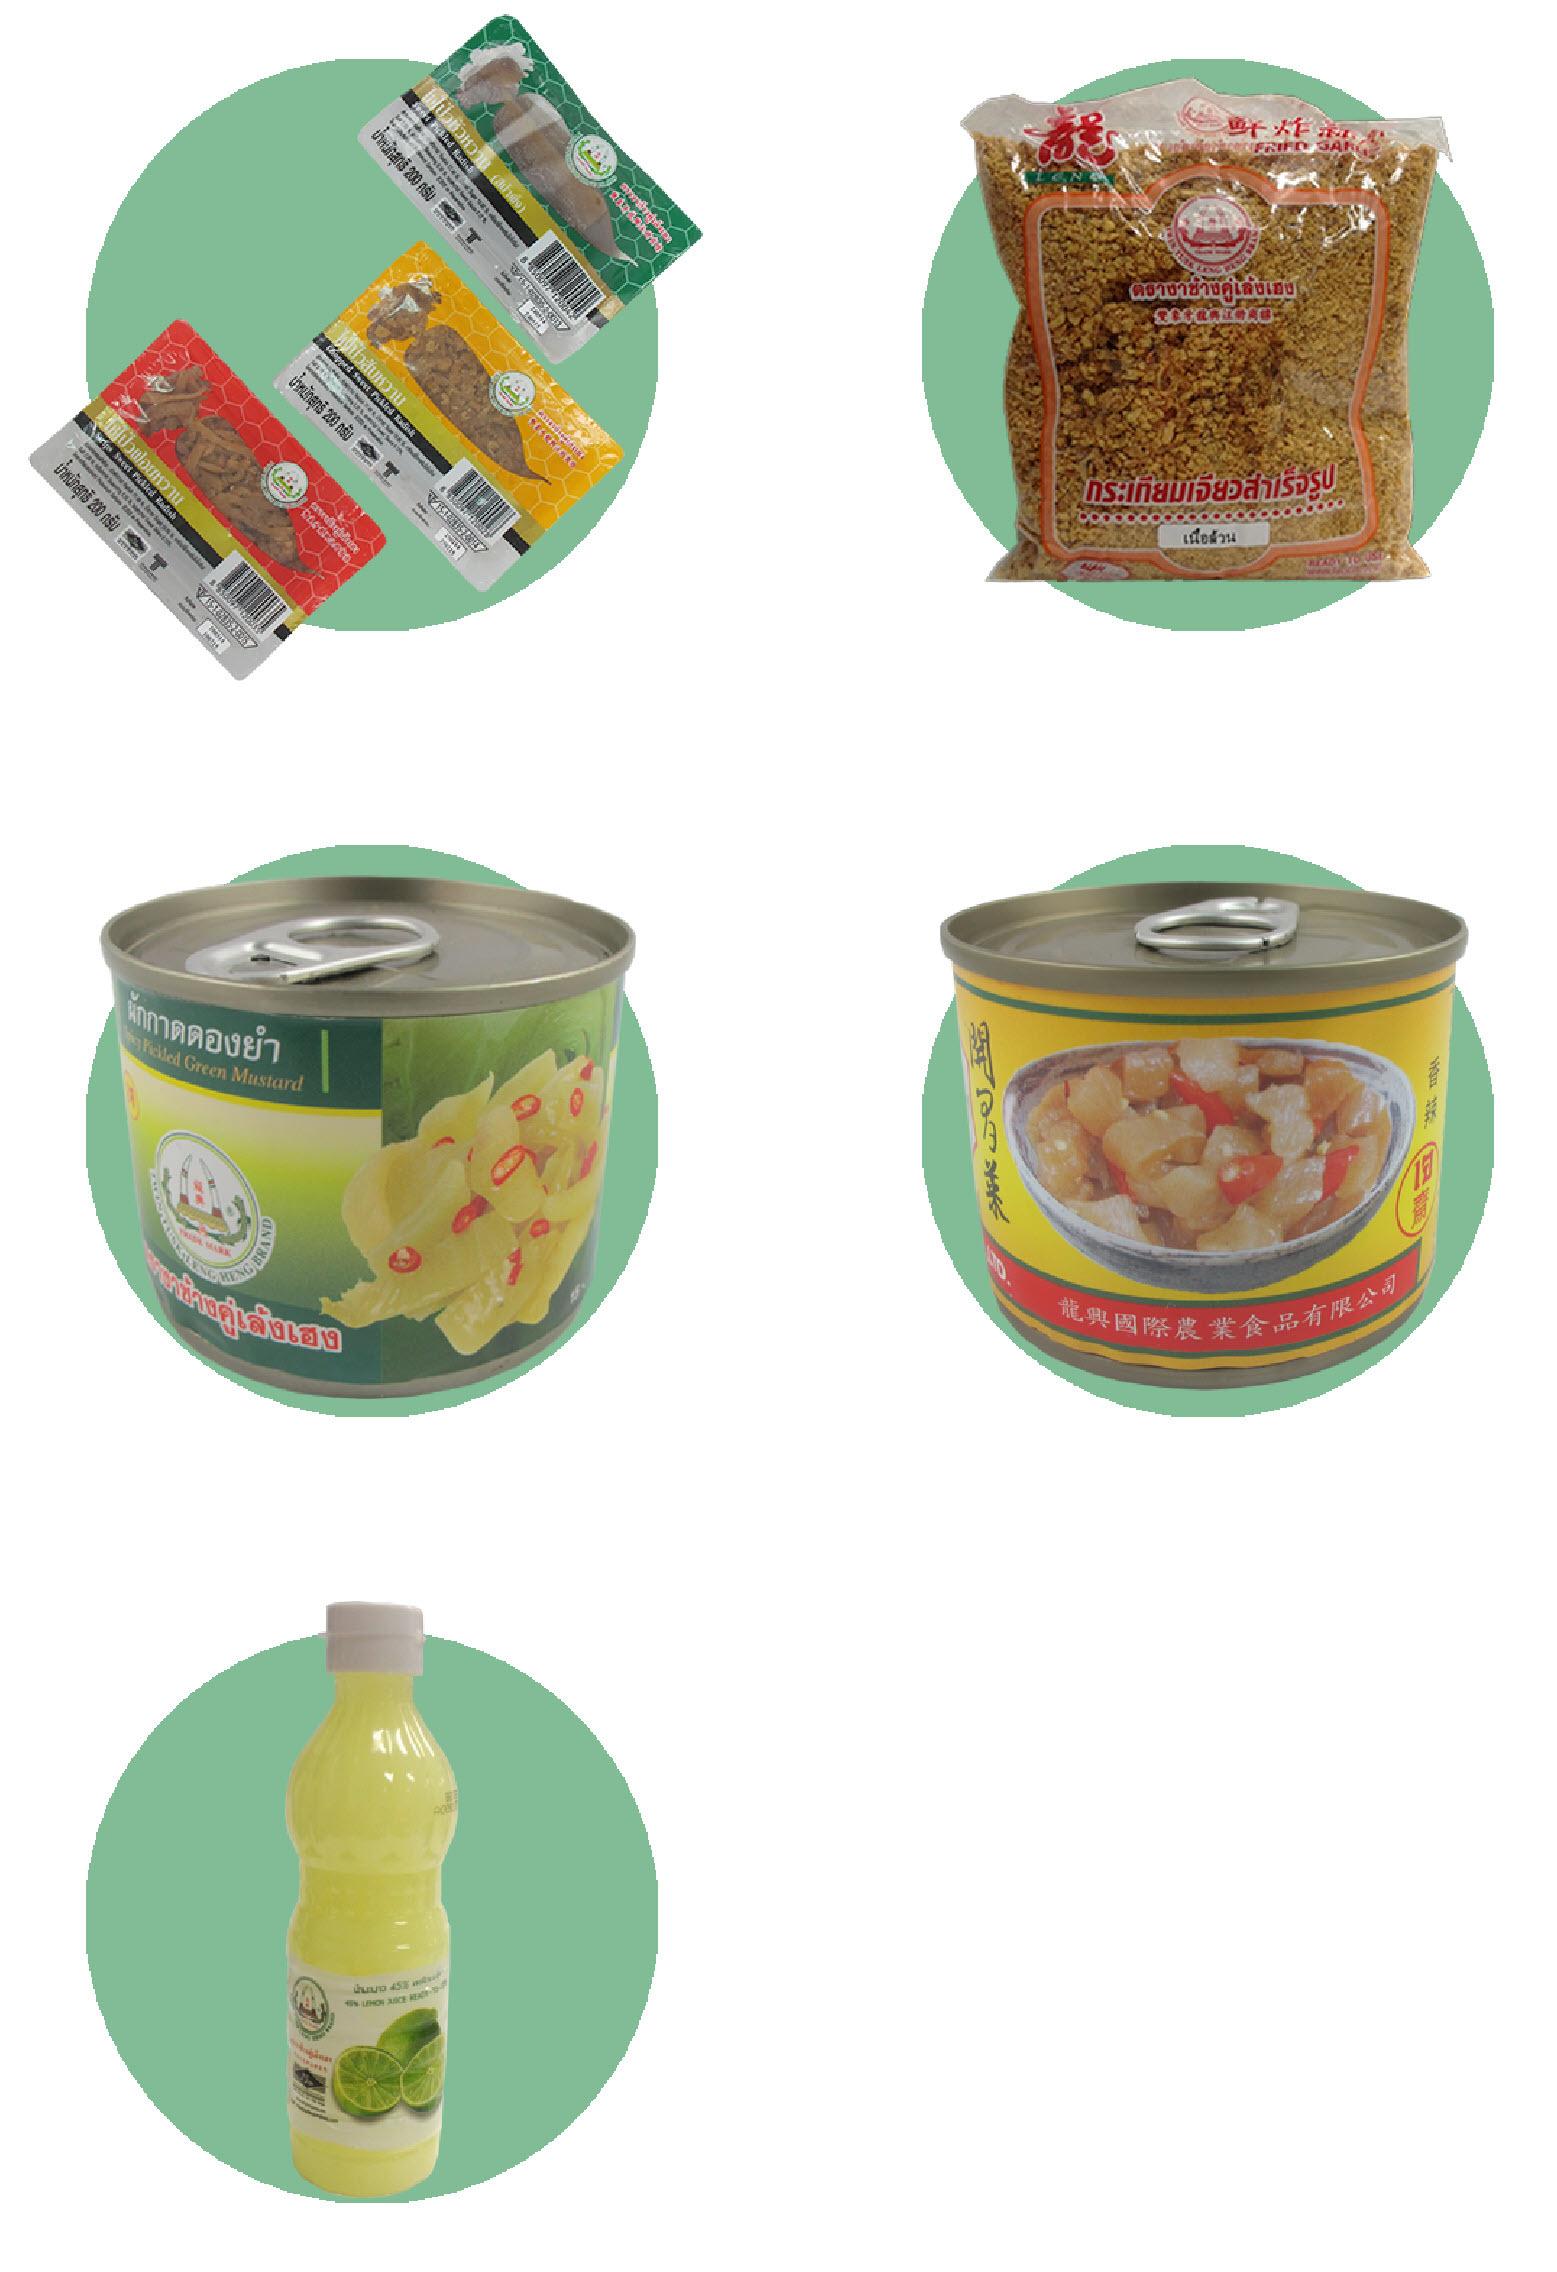 Pickled Vegetable (Twin  Leng Heng)